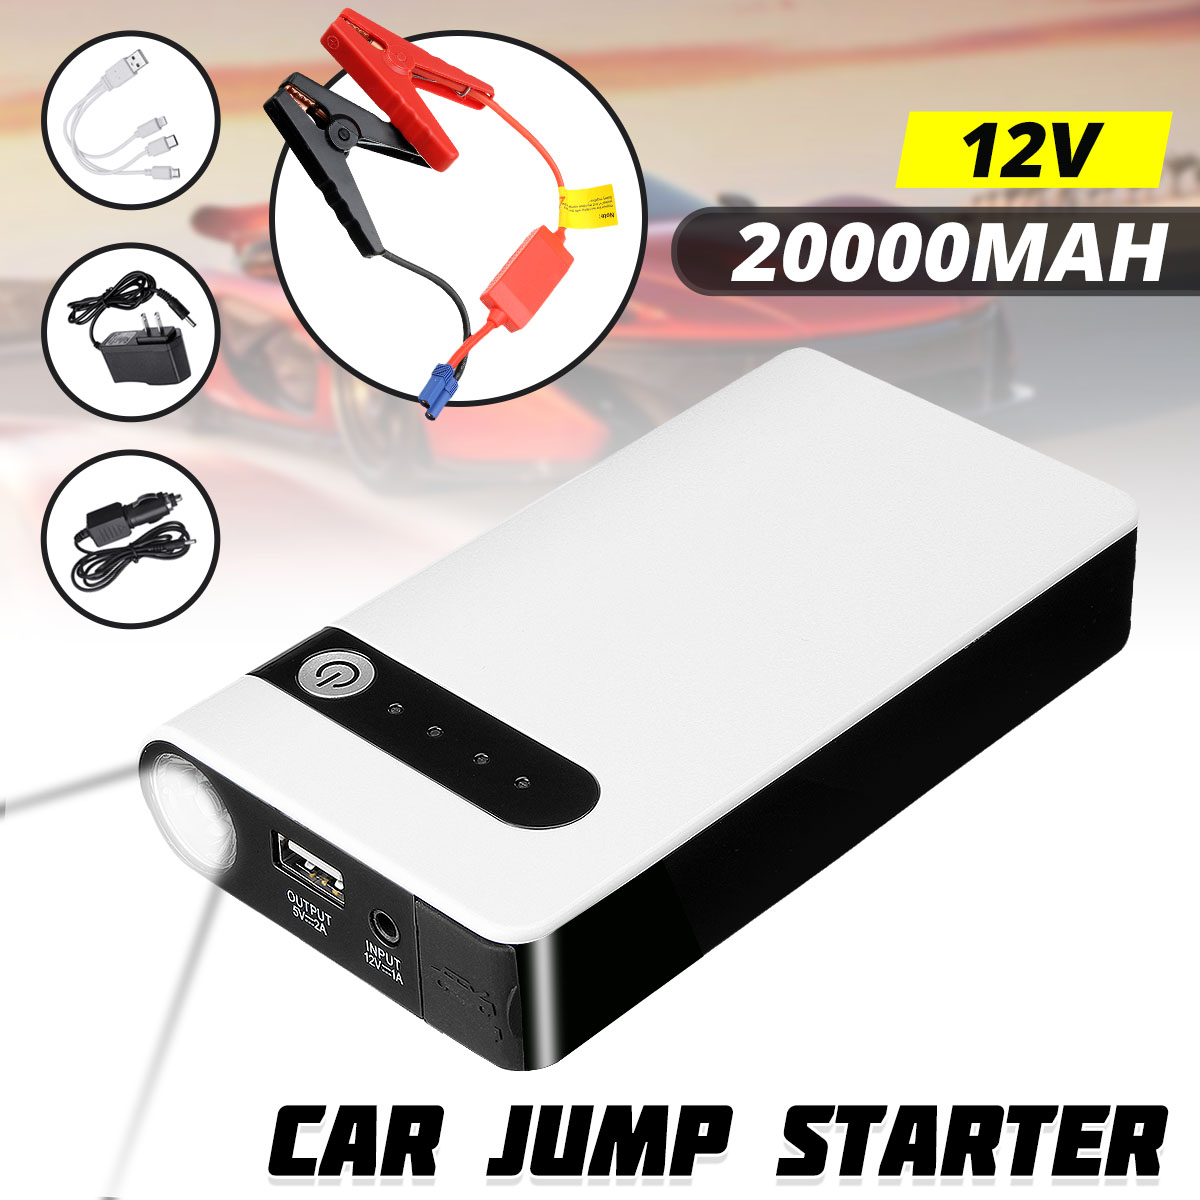 20000MAh 12VแบบพกพารถJump Starterแบตเตอรี่ฉุกเฉินBooster Powerbankกันน้ำLEDไฟฉาย 3-In-1 พอร์ตUSB